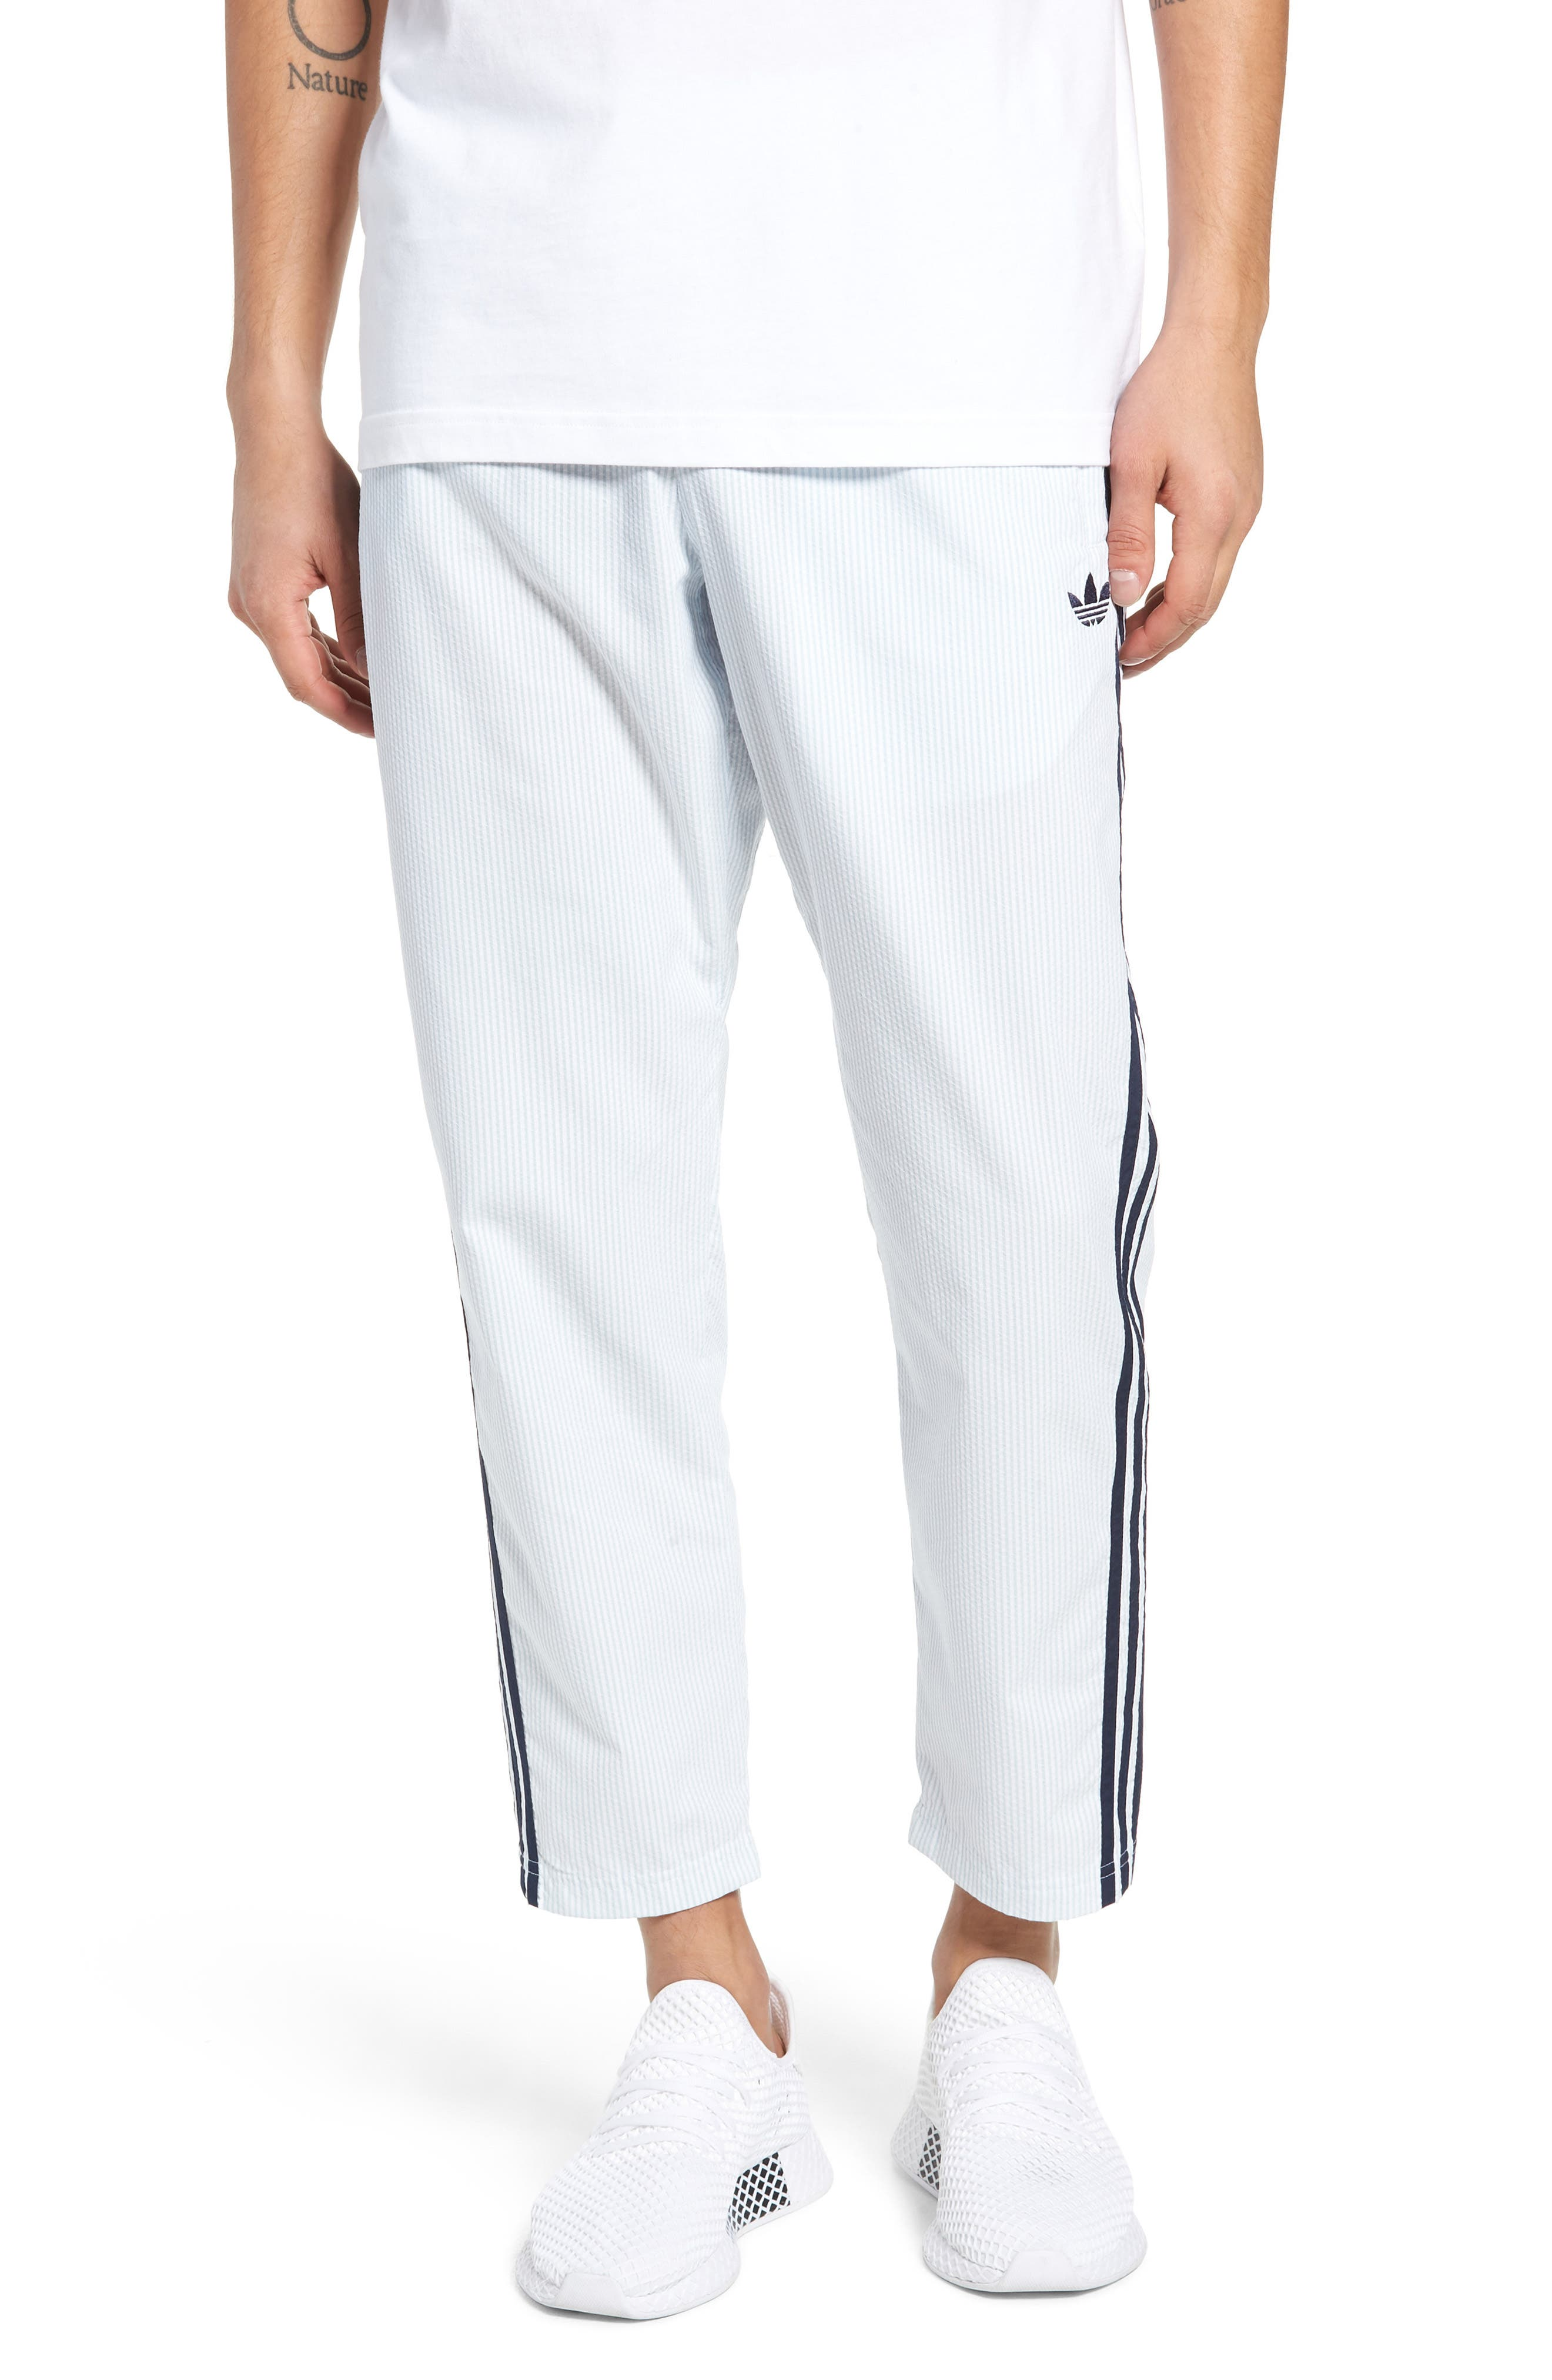 ADIDAS ORIGINALS, Seersucker Track Pants, Main thumbnail 1, color, ASH GREY/ WHITE